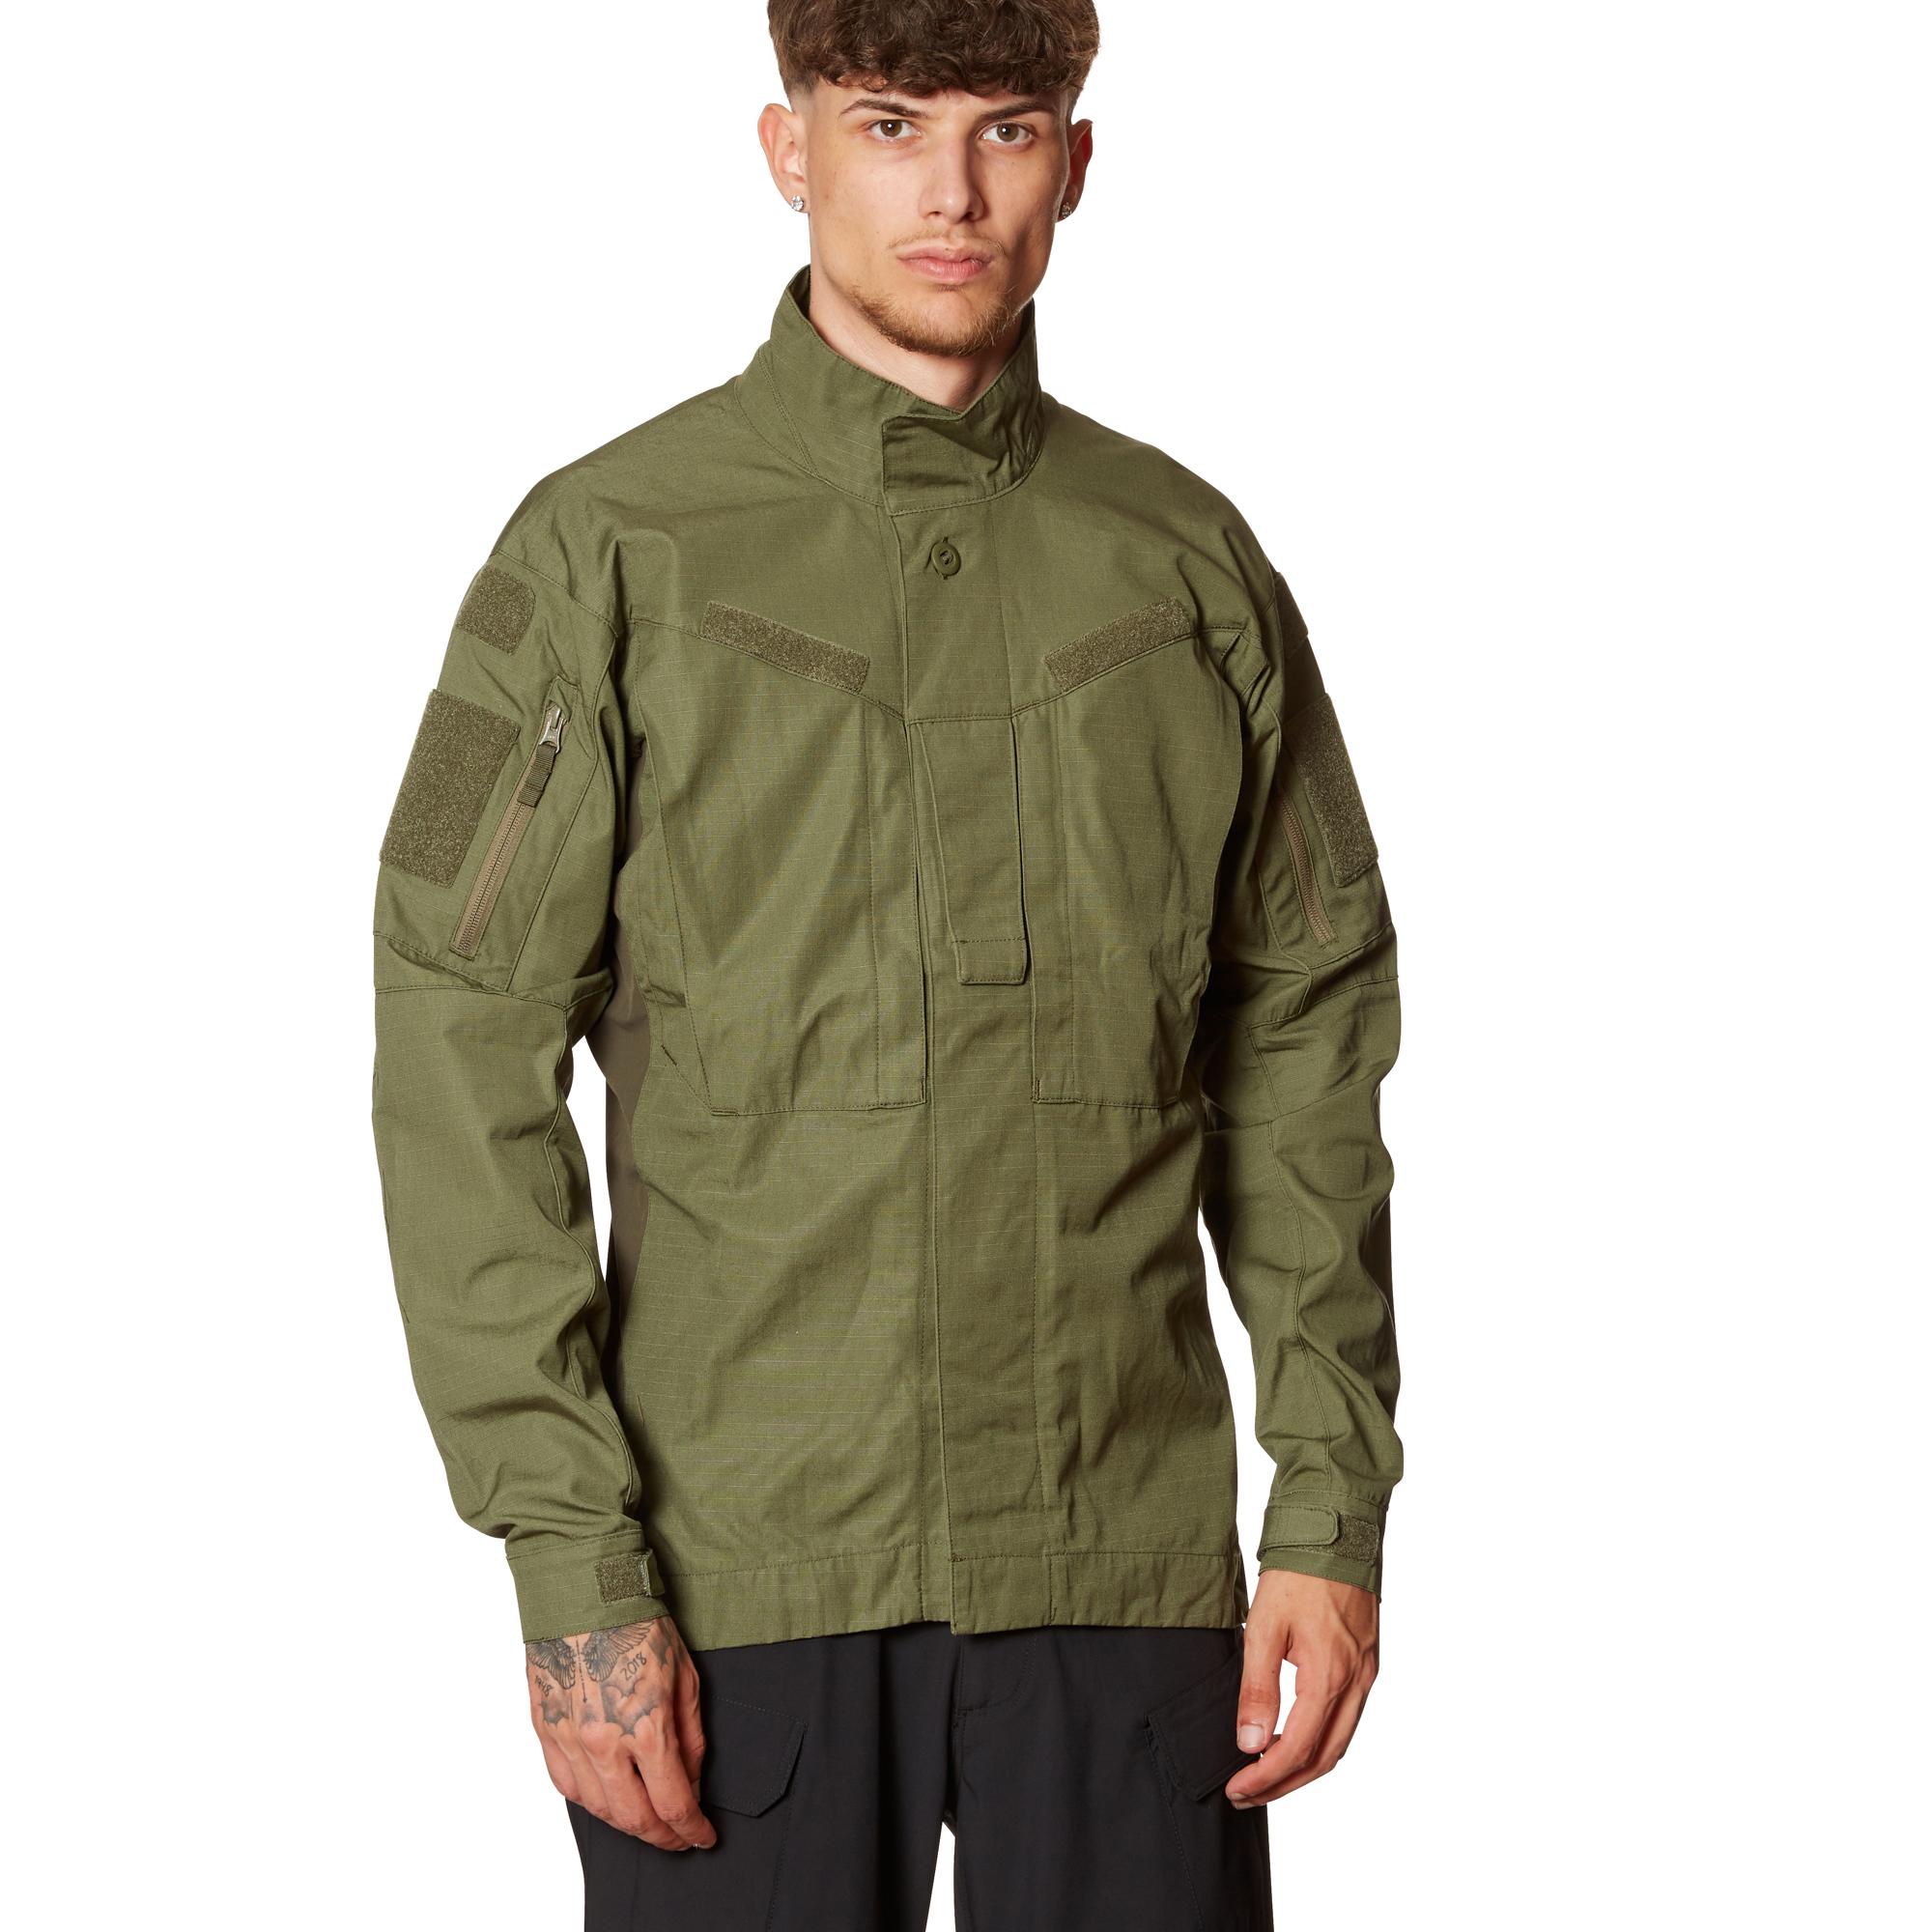 Helikon-Tex Chemise de combat MBDU Shirt olive